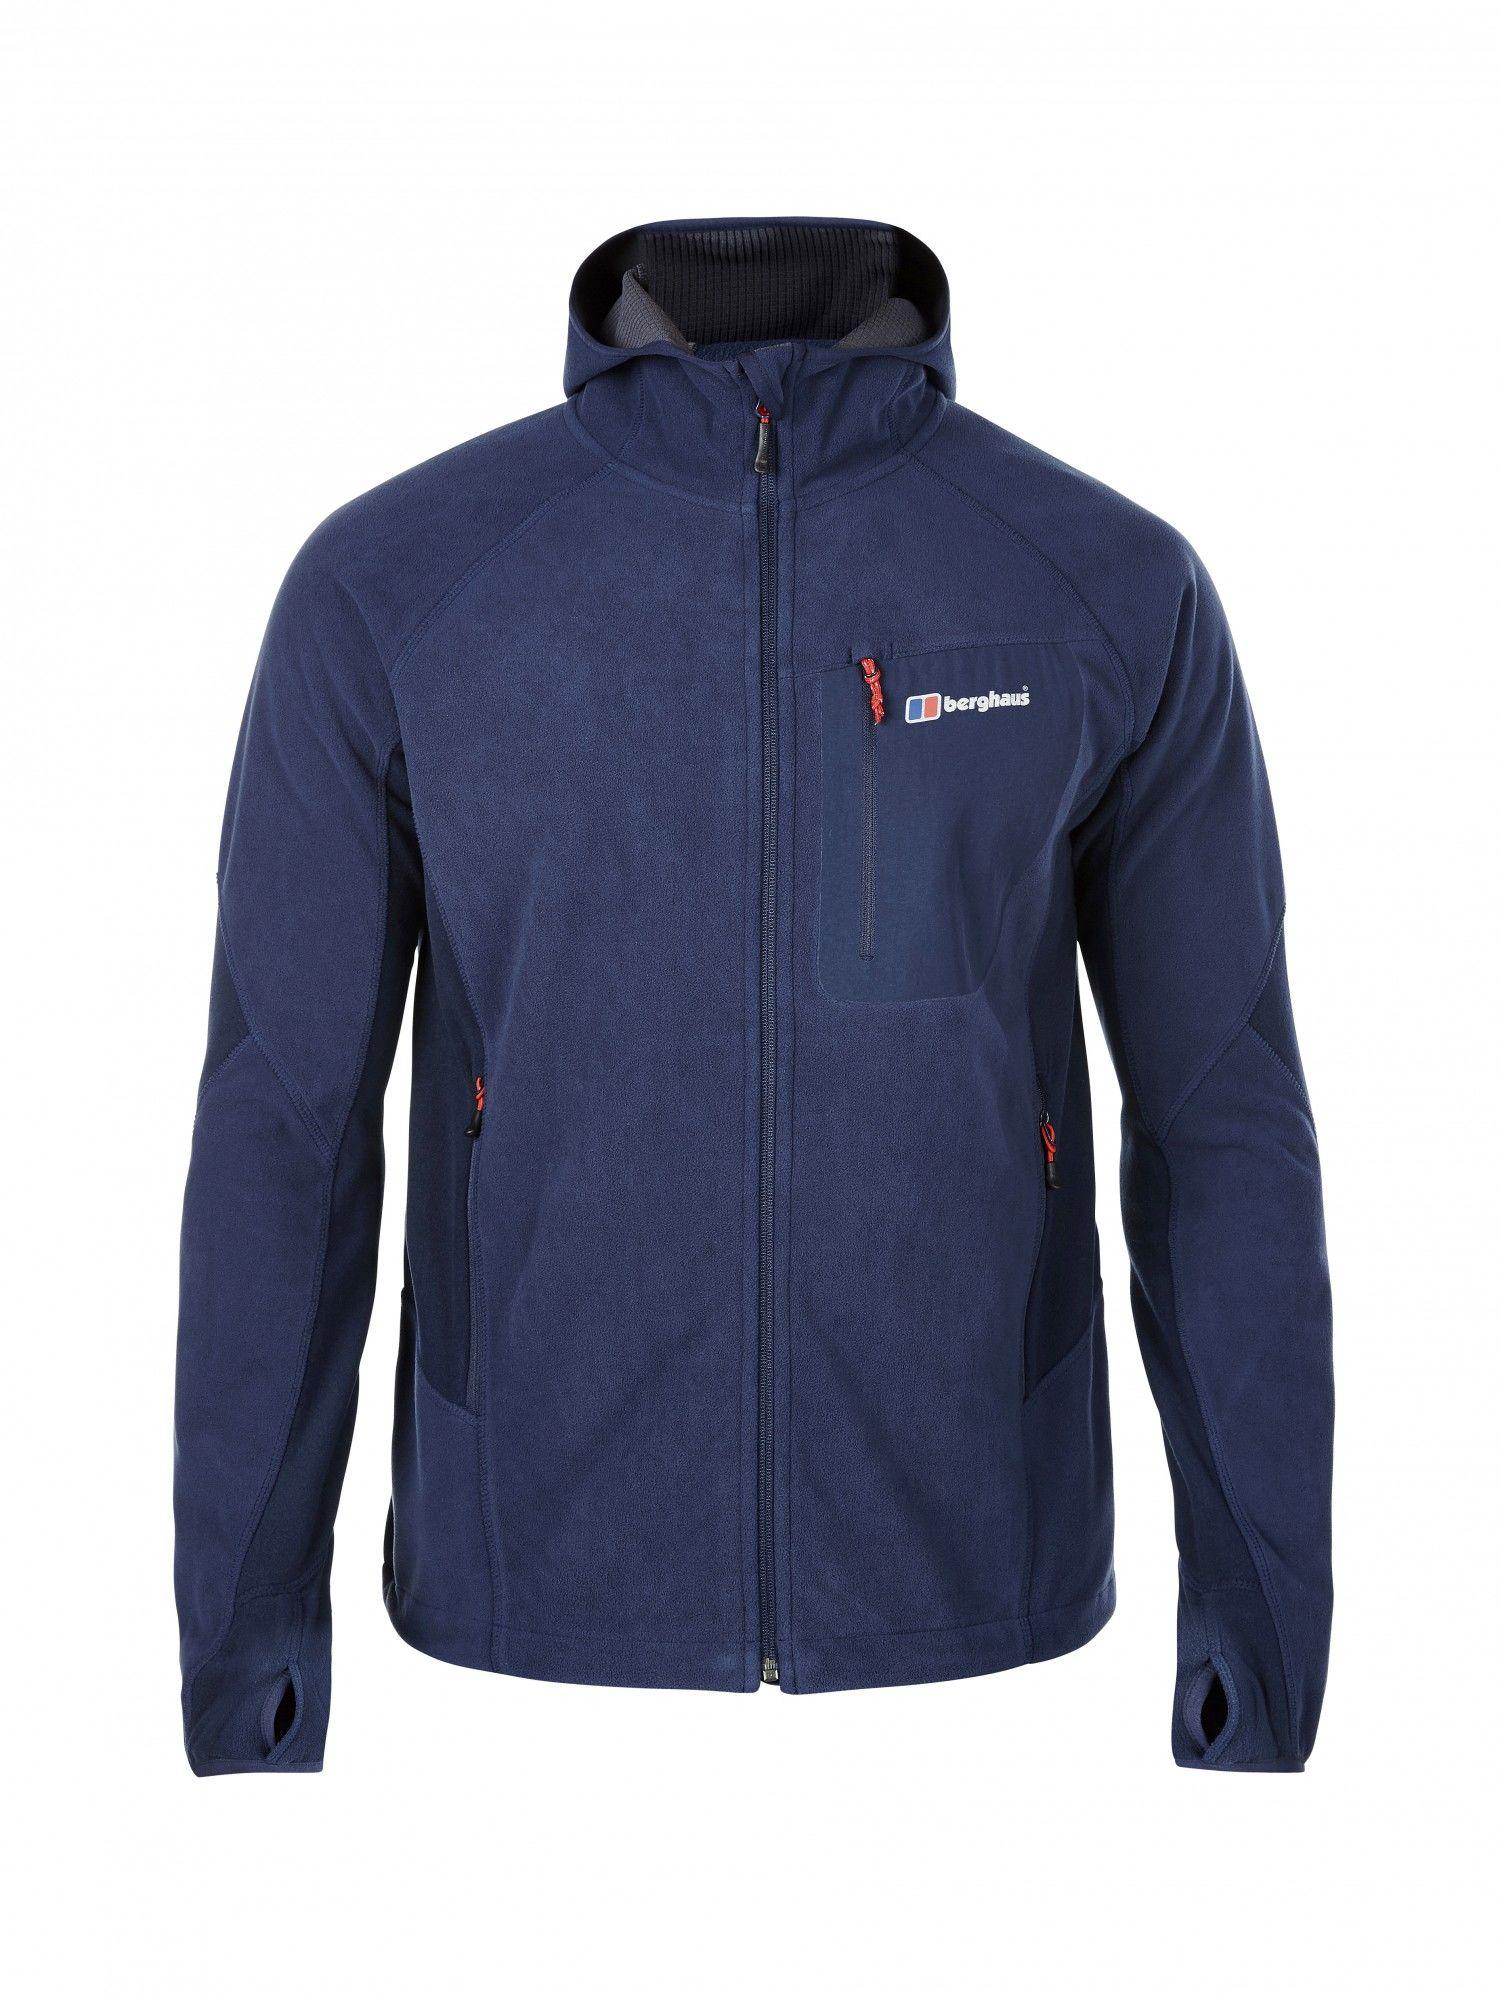 Berghaus M BEN OSS Windproof Hooded Jacket | Größe S,L | Herren Fleecejacke